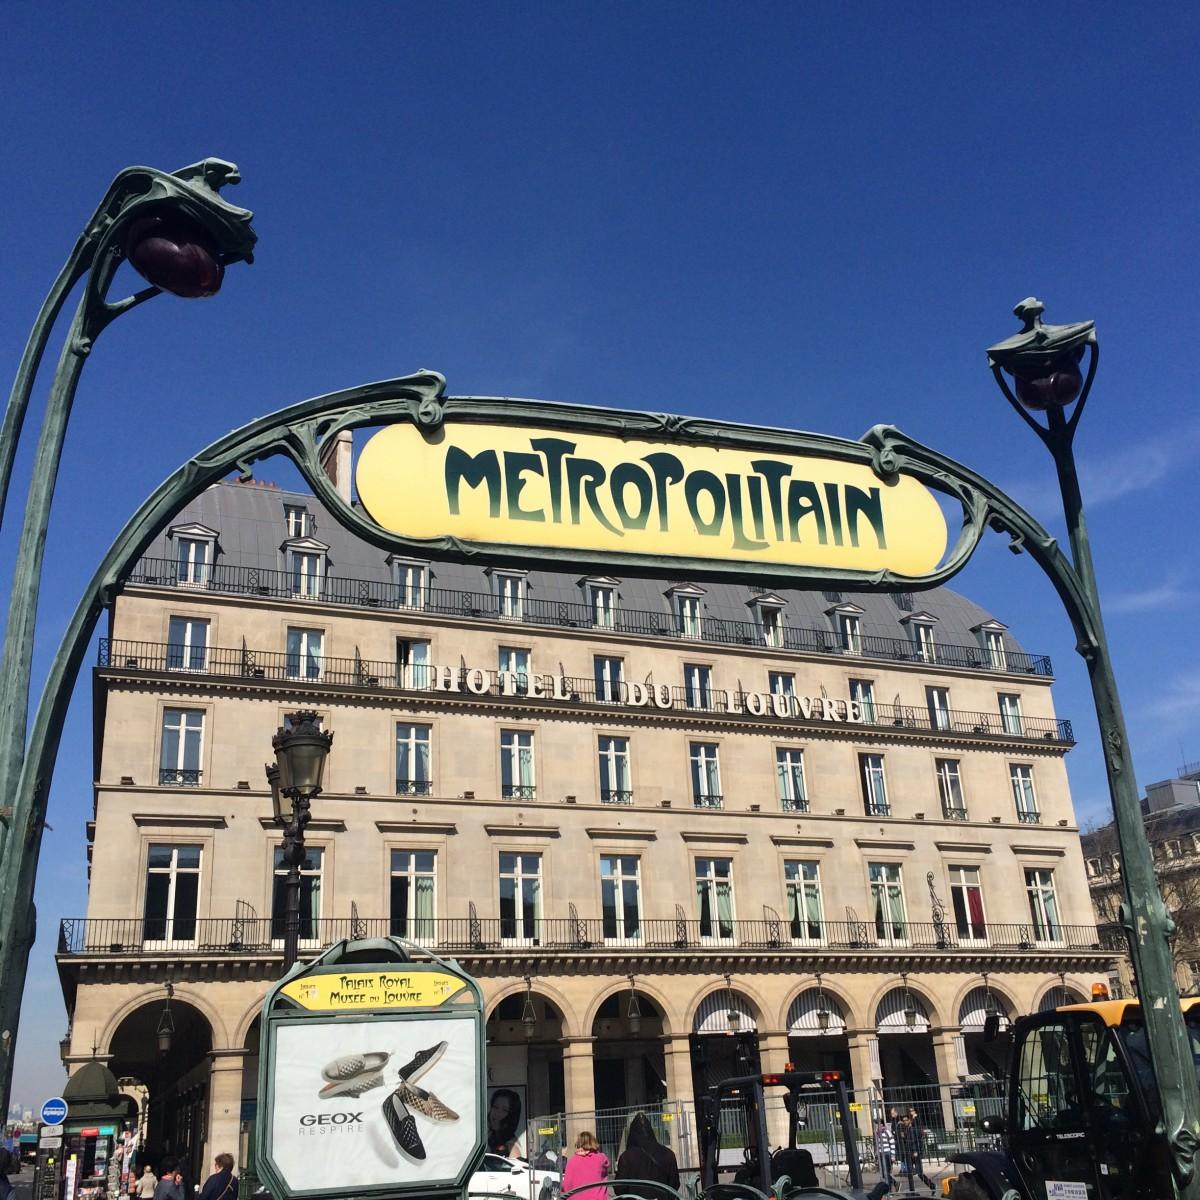 Metro Station at Louvre, Paris, France